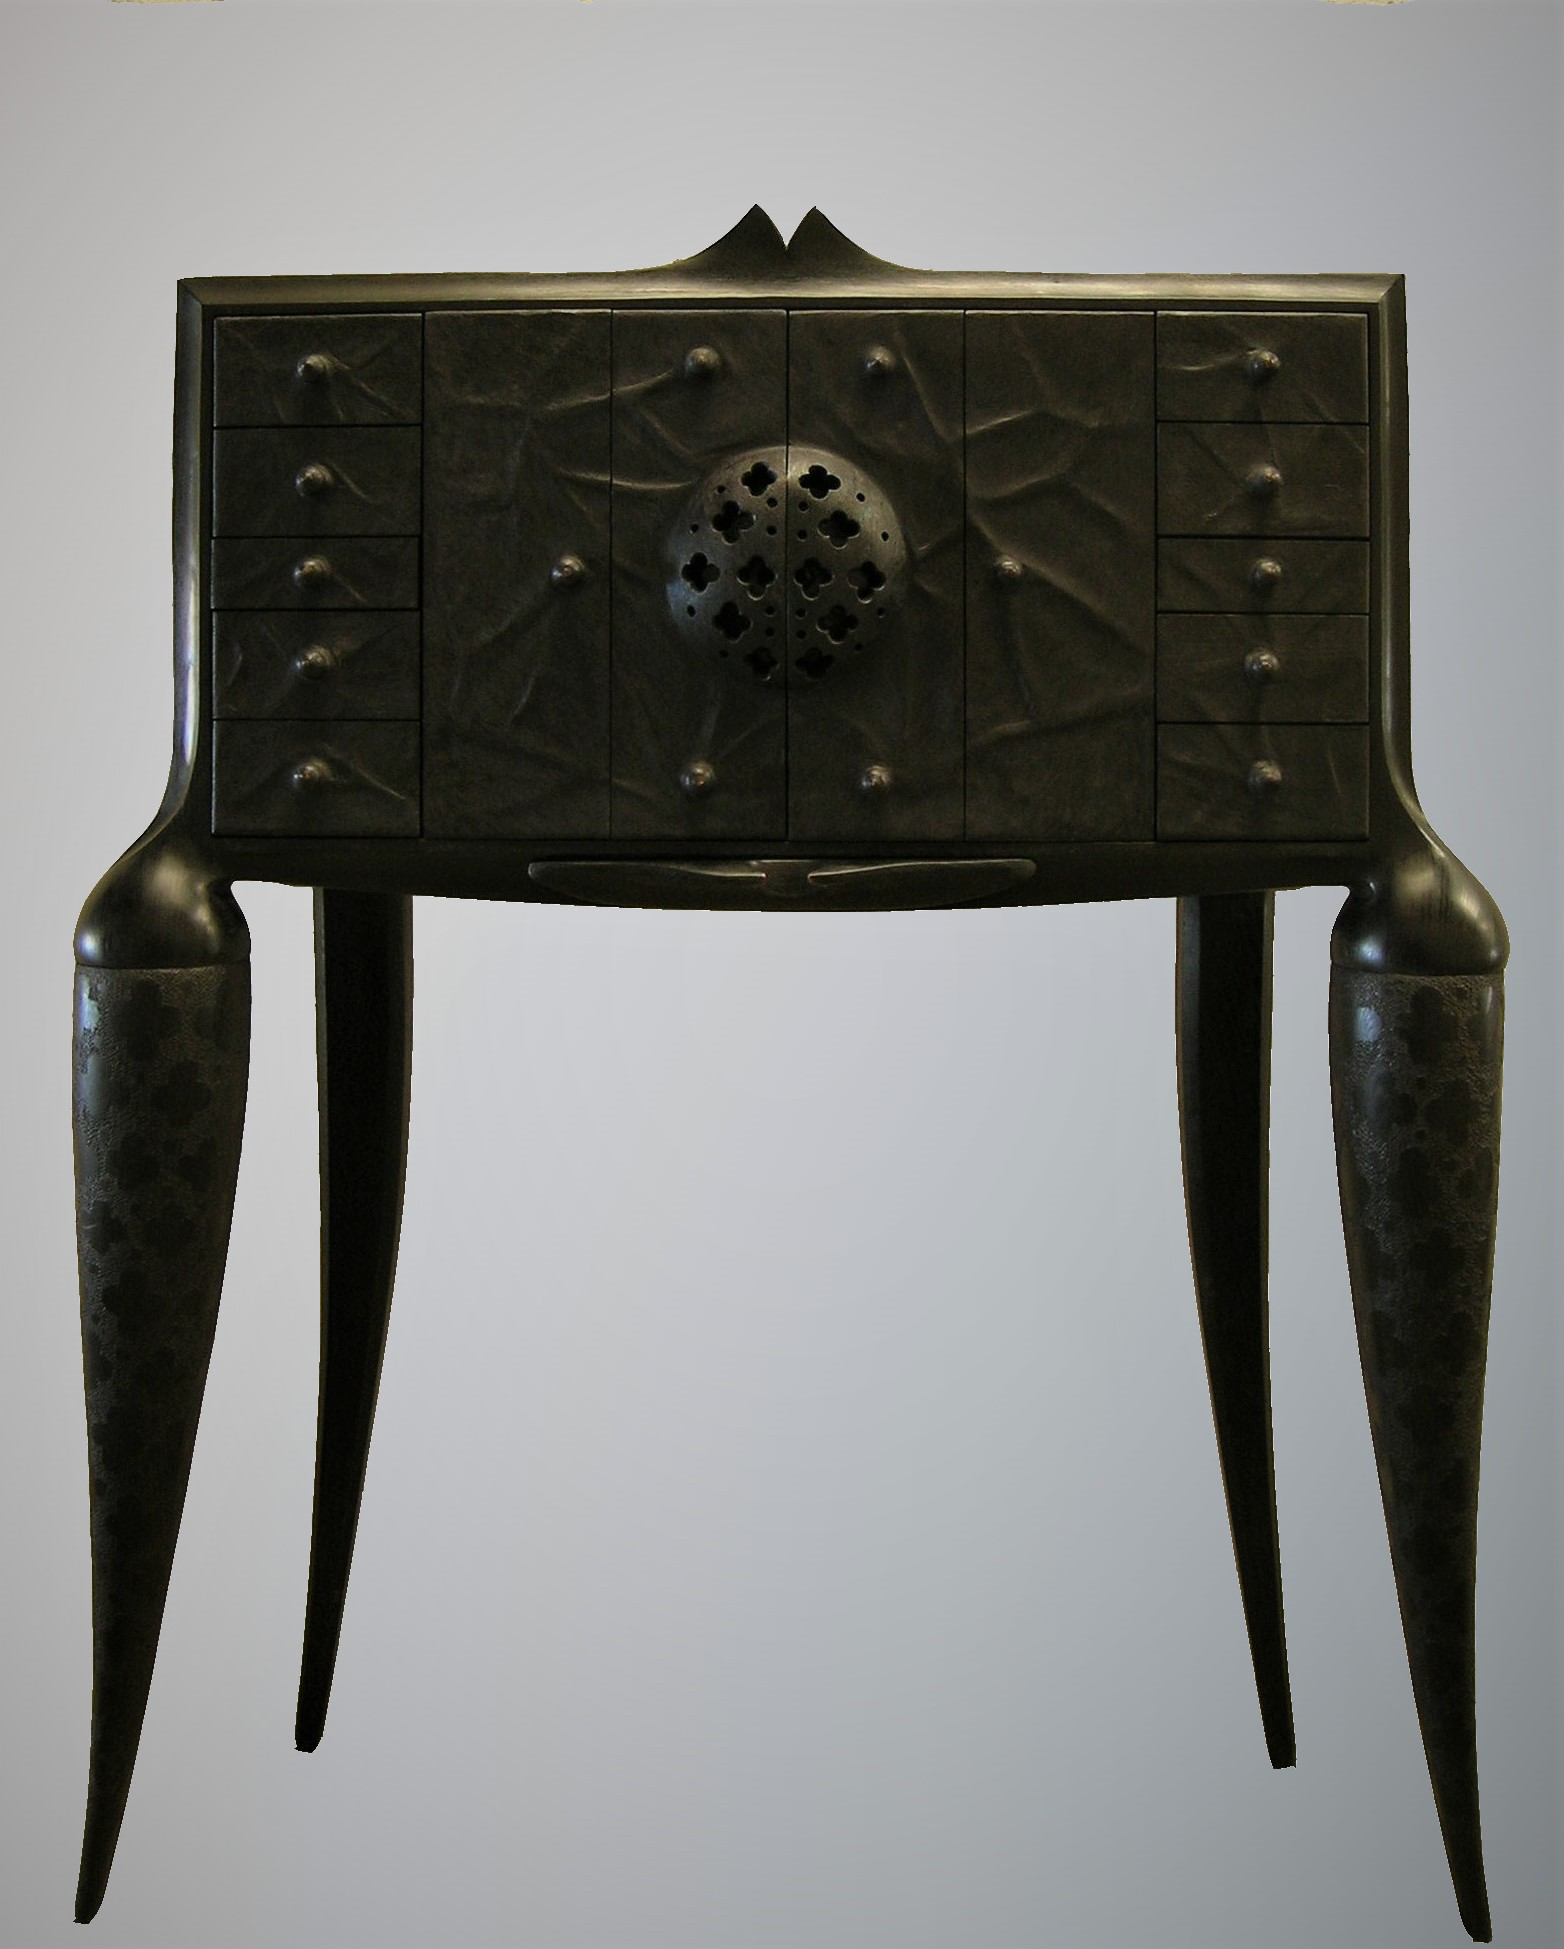 Cabinet 168 x 120 x 55 cm